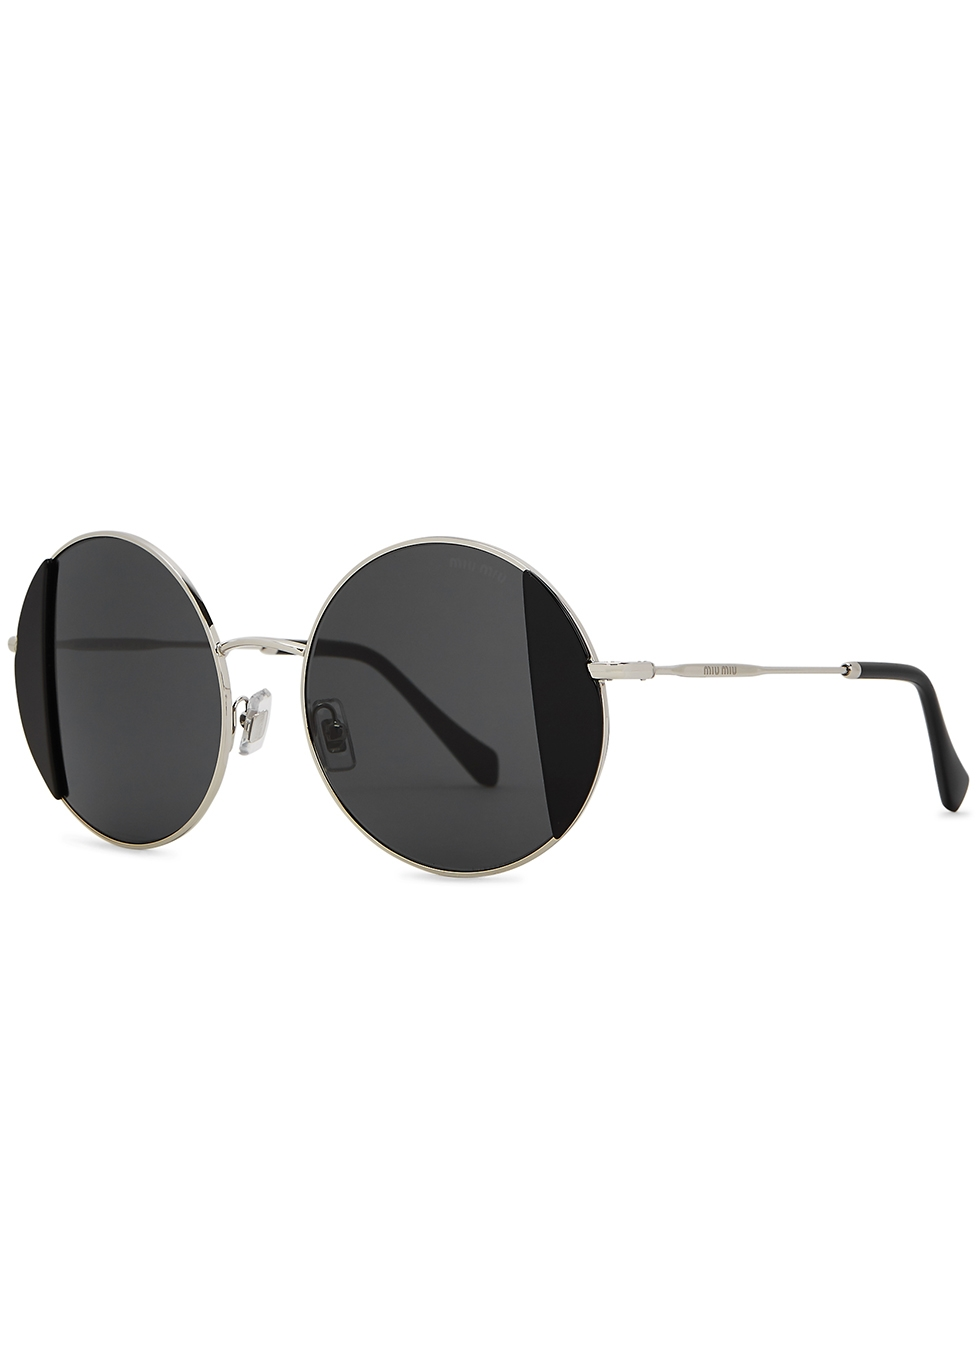 Noir silver-tone round-frame sunglasses